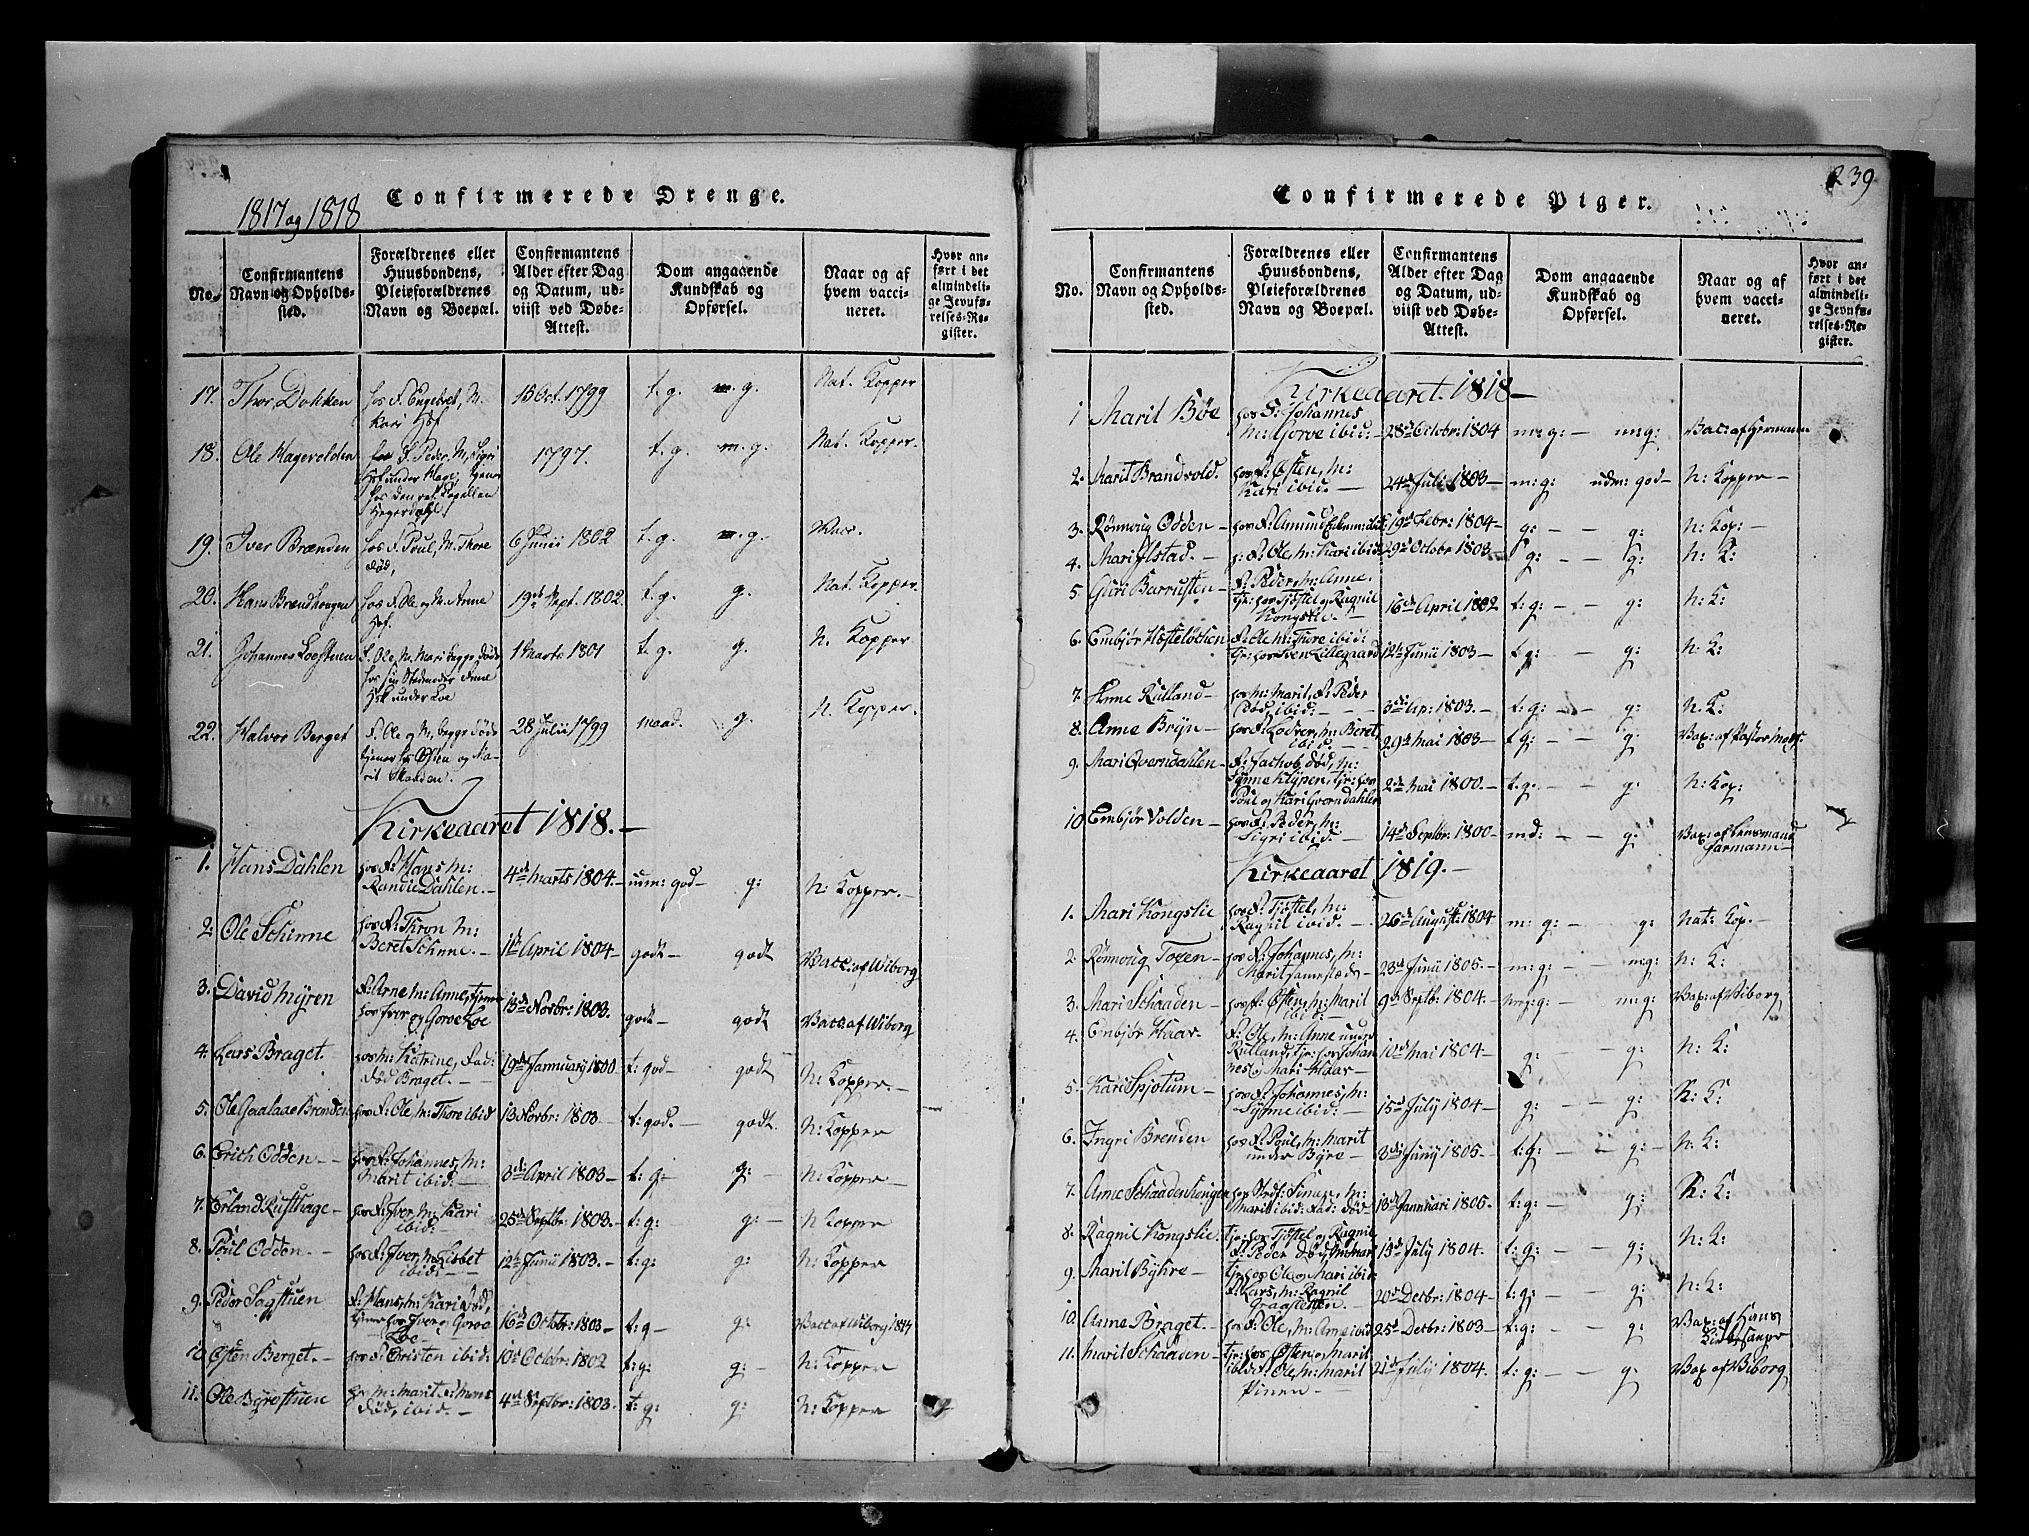 SAH, Fron prestekontor, H/Ha/Hab/L0004: Klokkerbok nr. 4, 1816-1850, s. 239